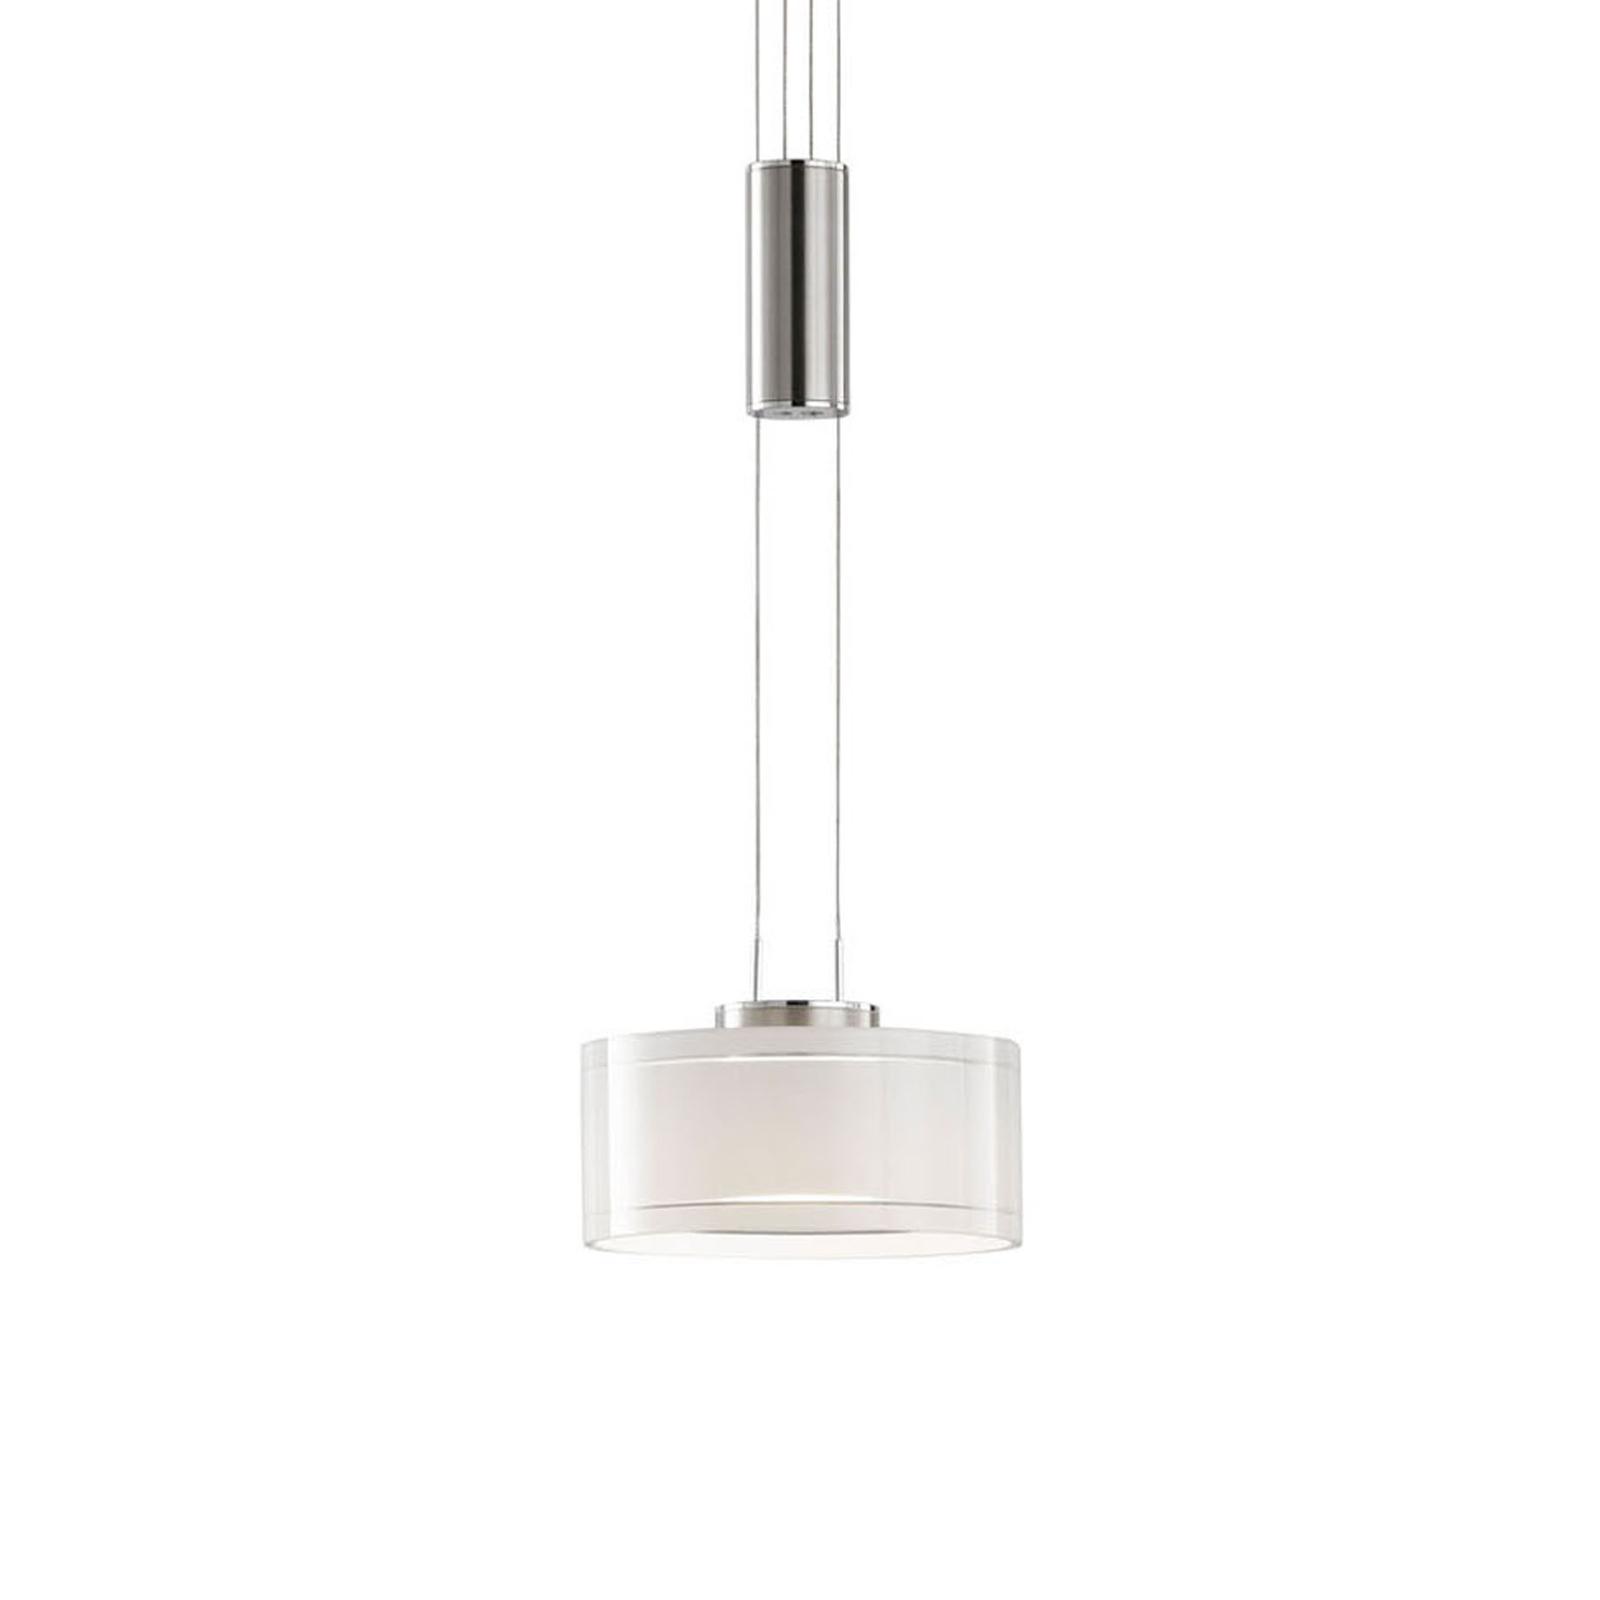 Lampada sospensione LED Lavin 1 luce nichel/bianco